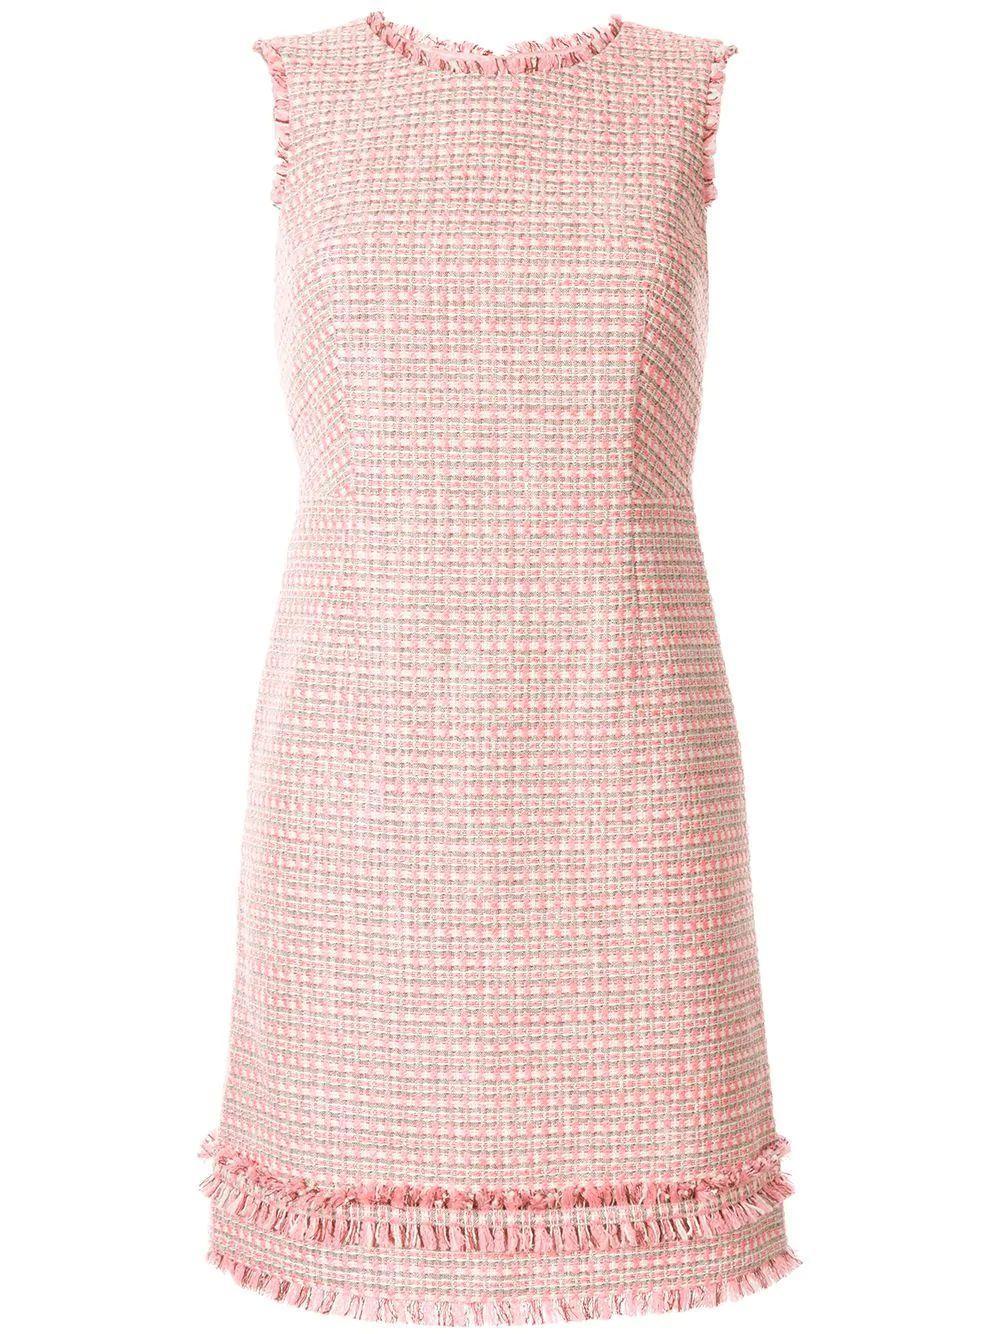 Sleeveless Woven Sheath Dress With Fringe Hem Item # 131/R47C